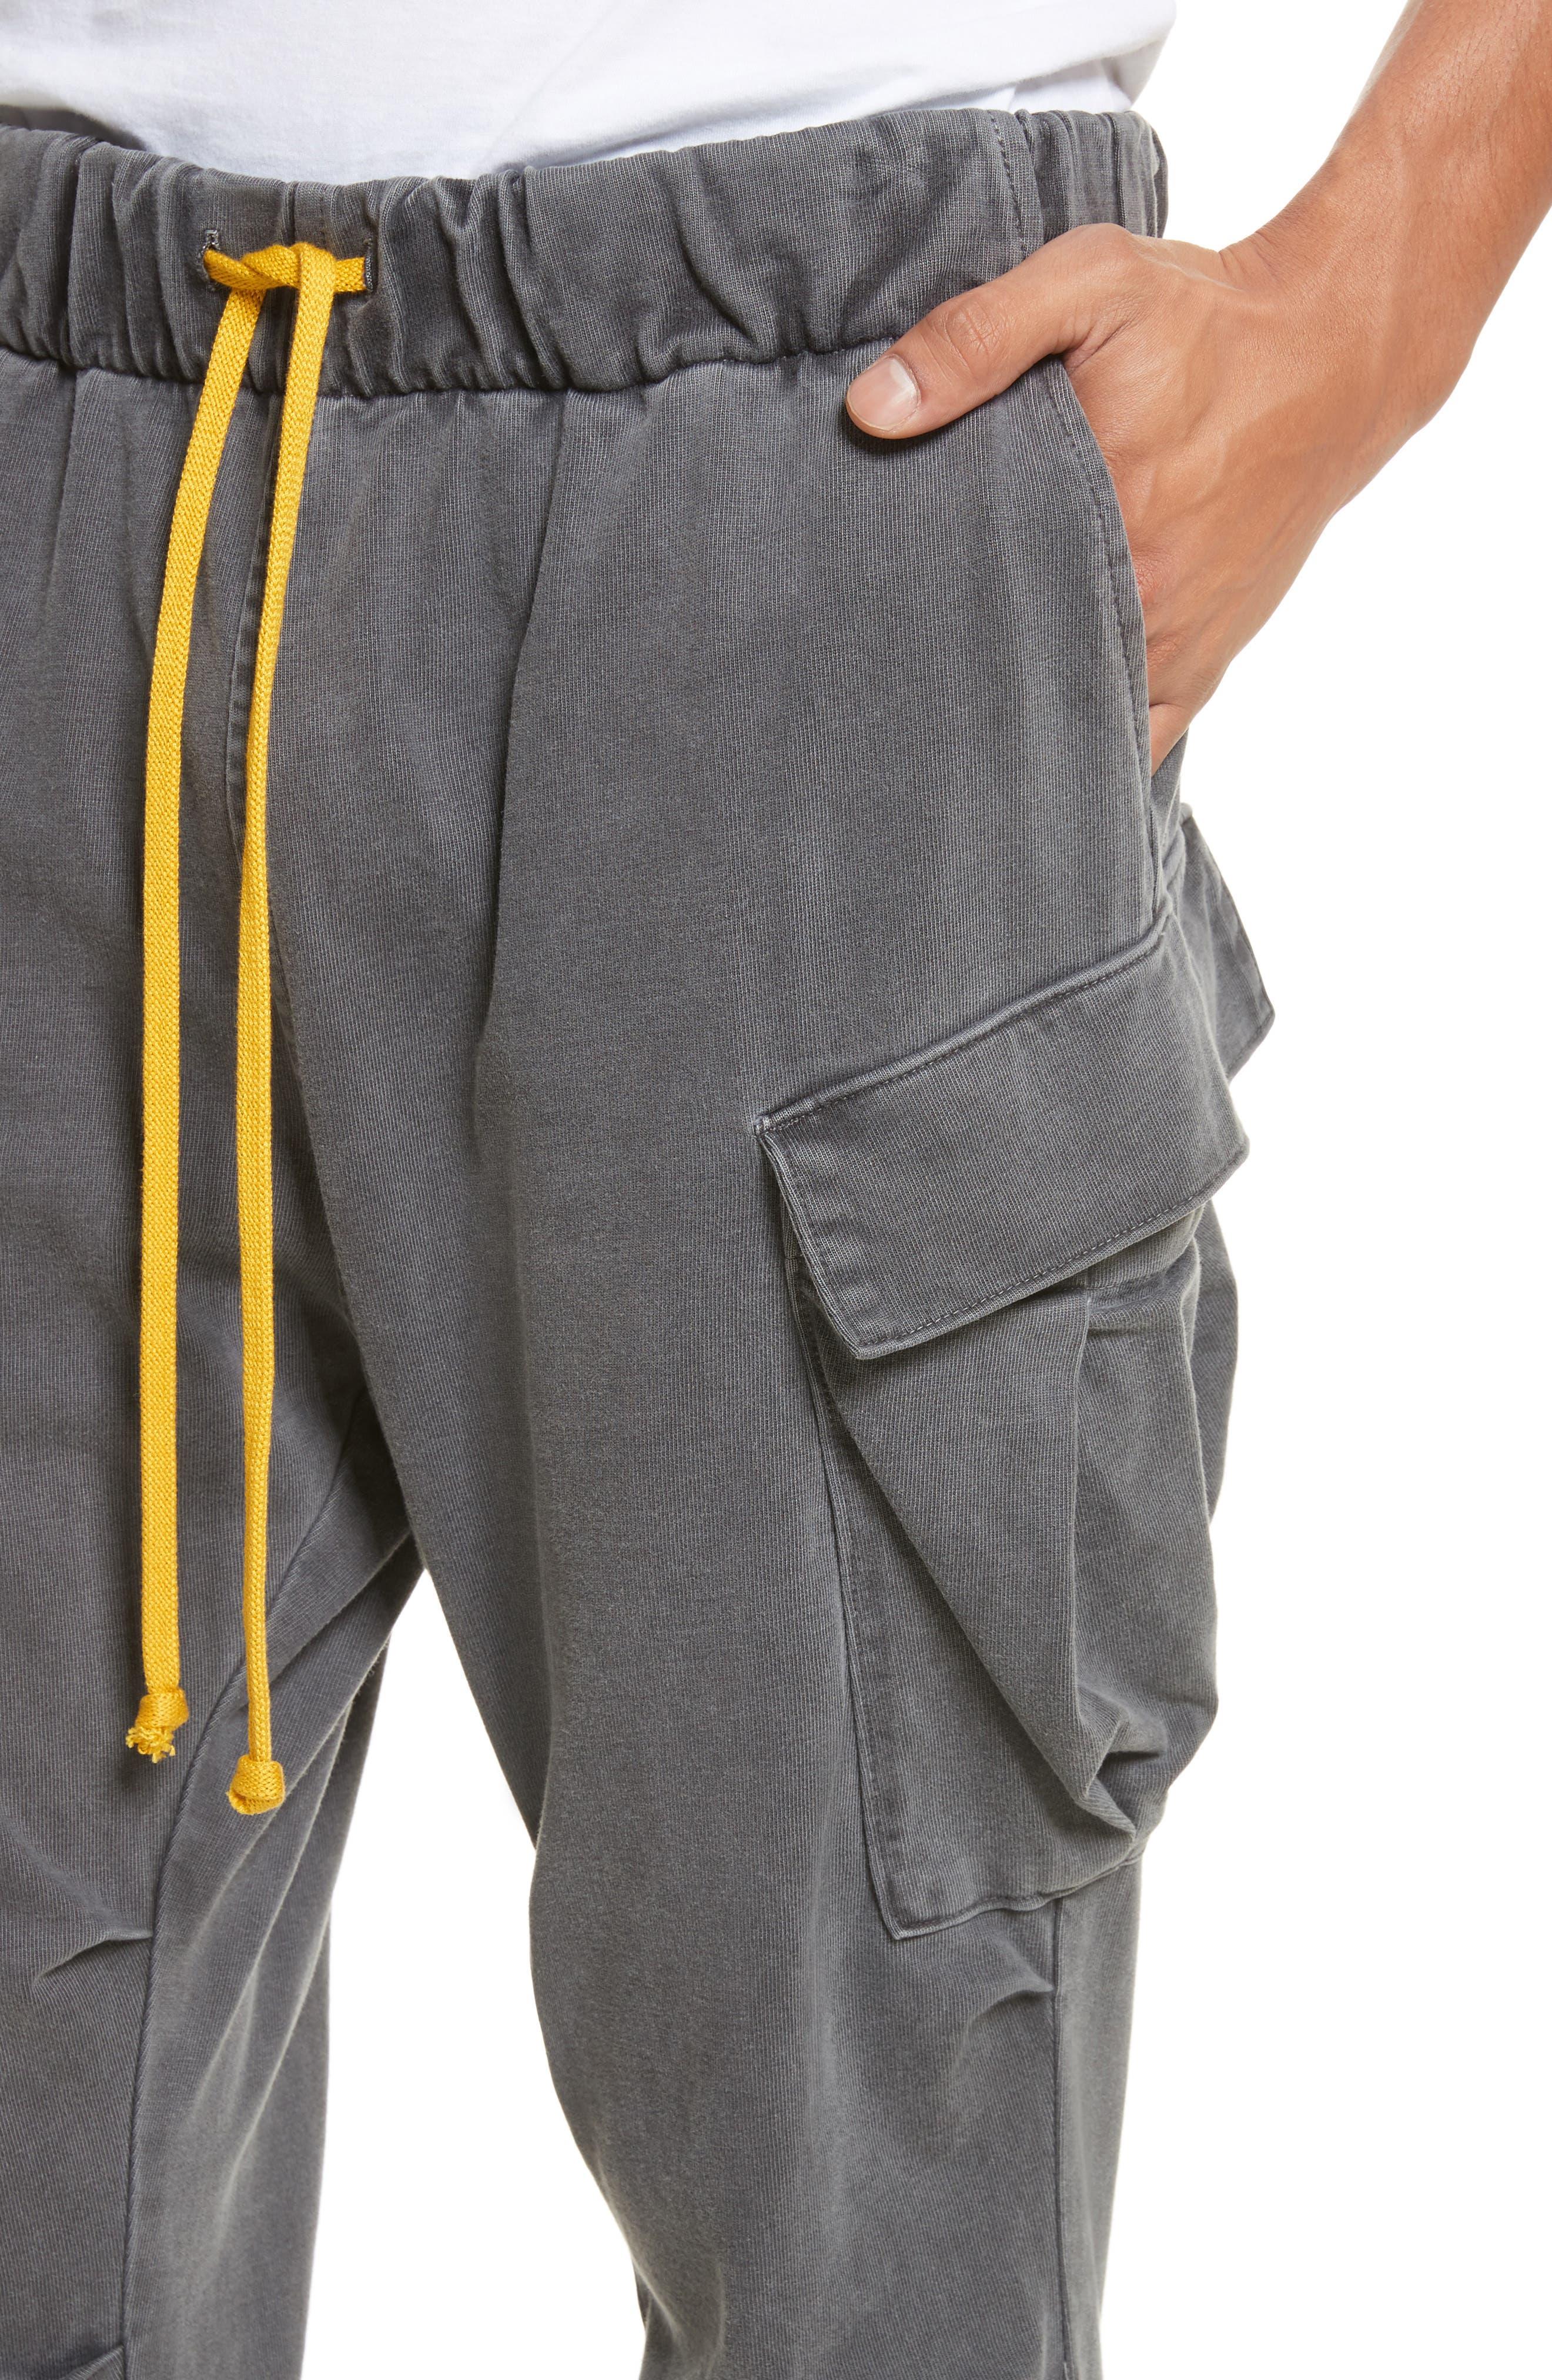 Geri Cropped Jogger Cargo Pants,                             Alternate thumbnail 4, color,                             989